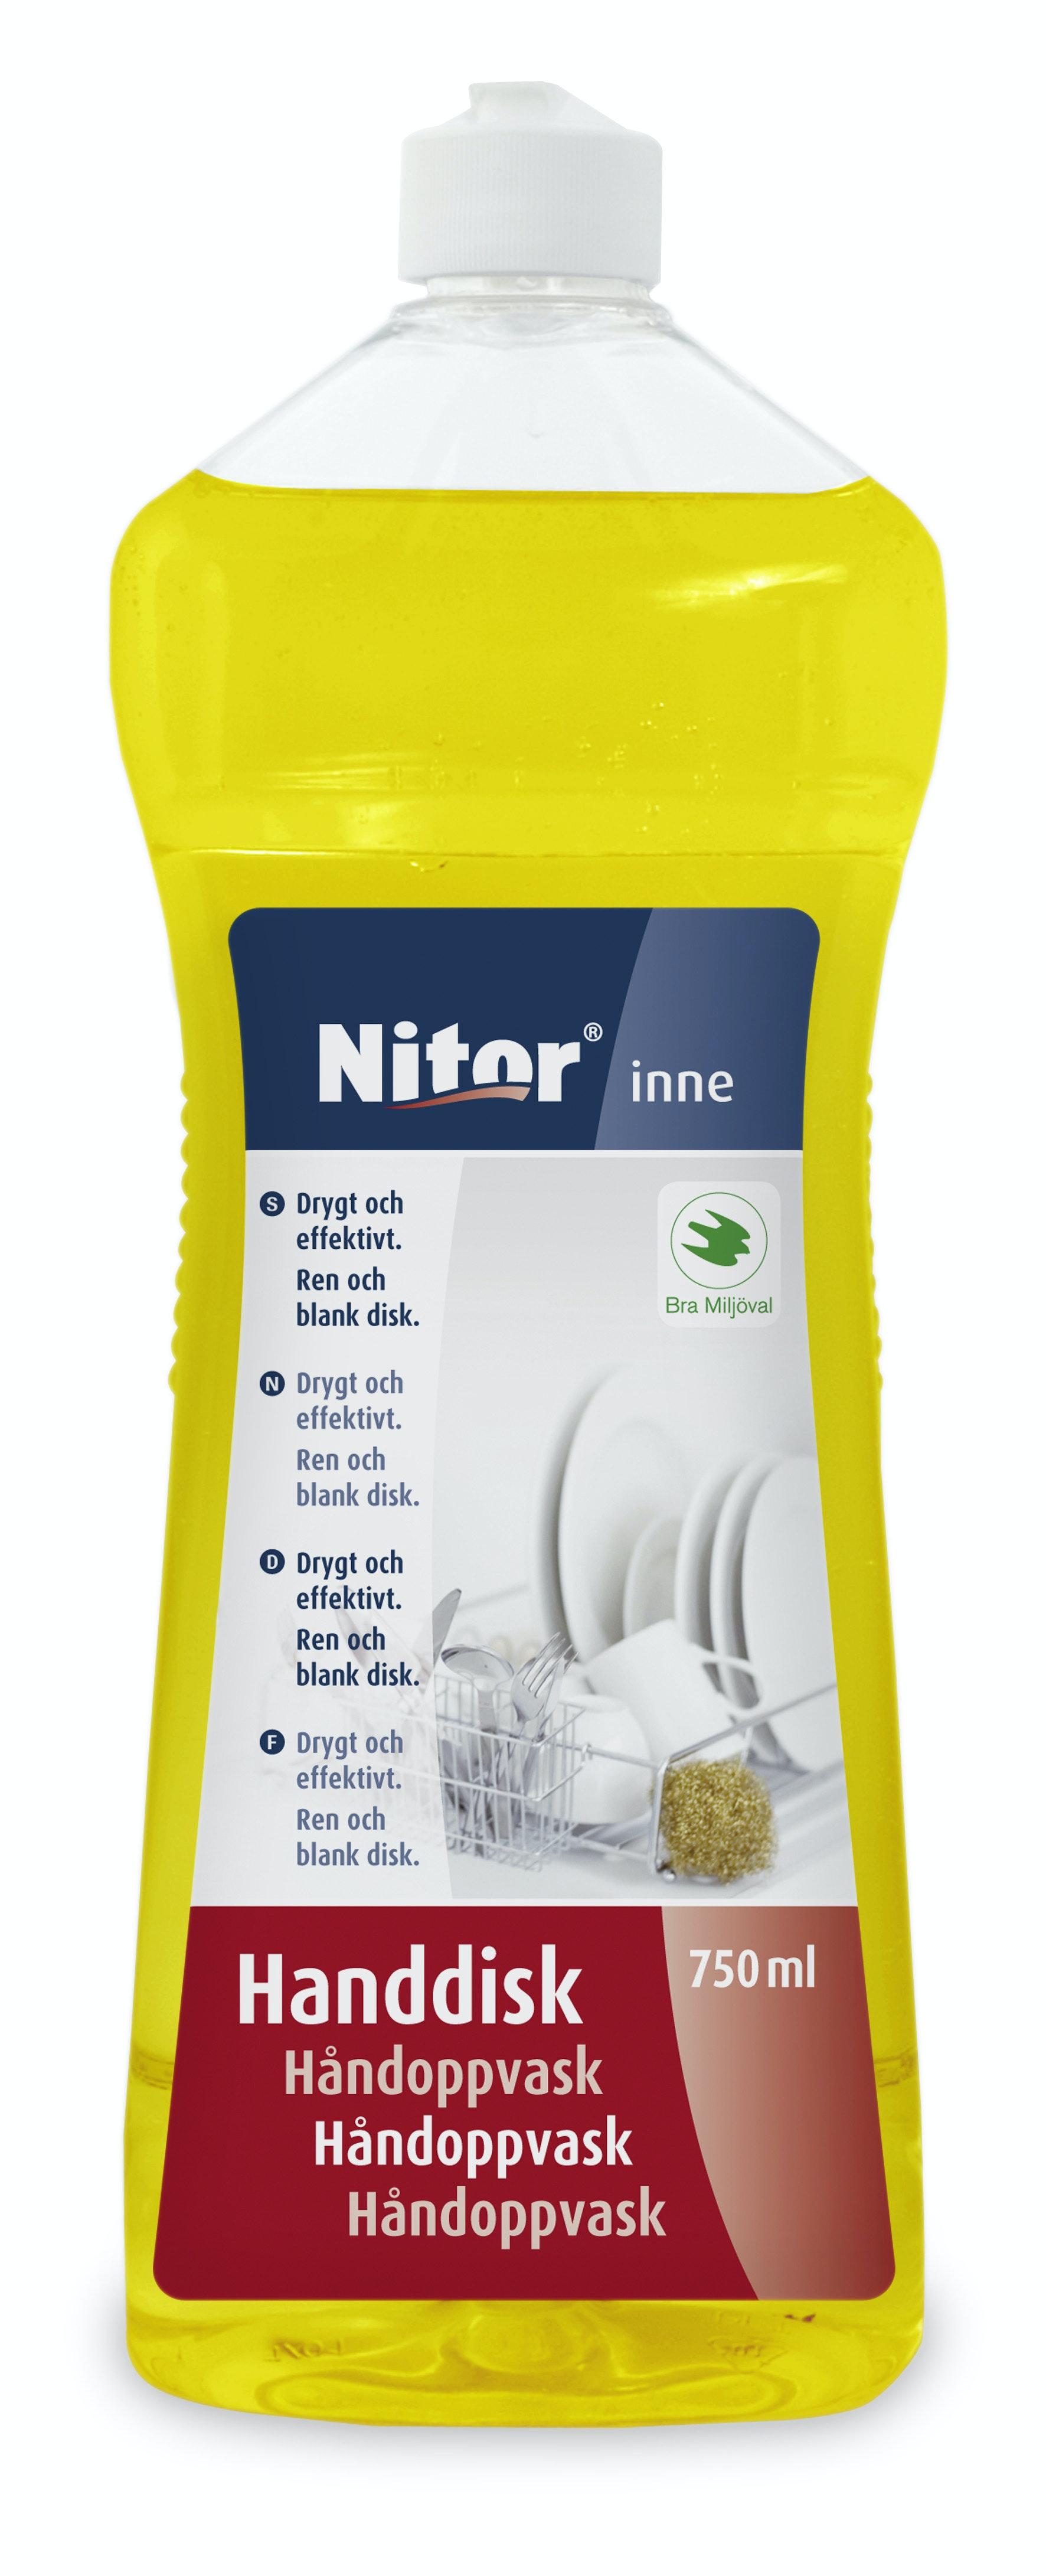 Handdisk Nitor 750ml